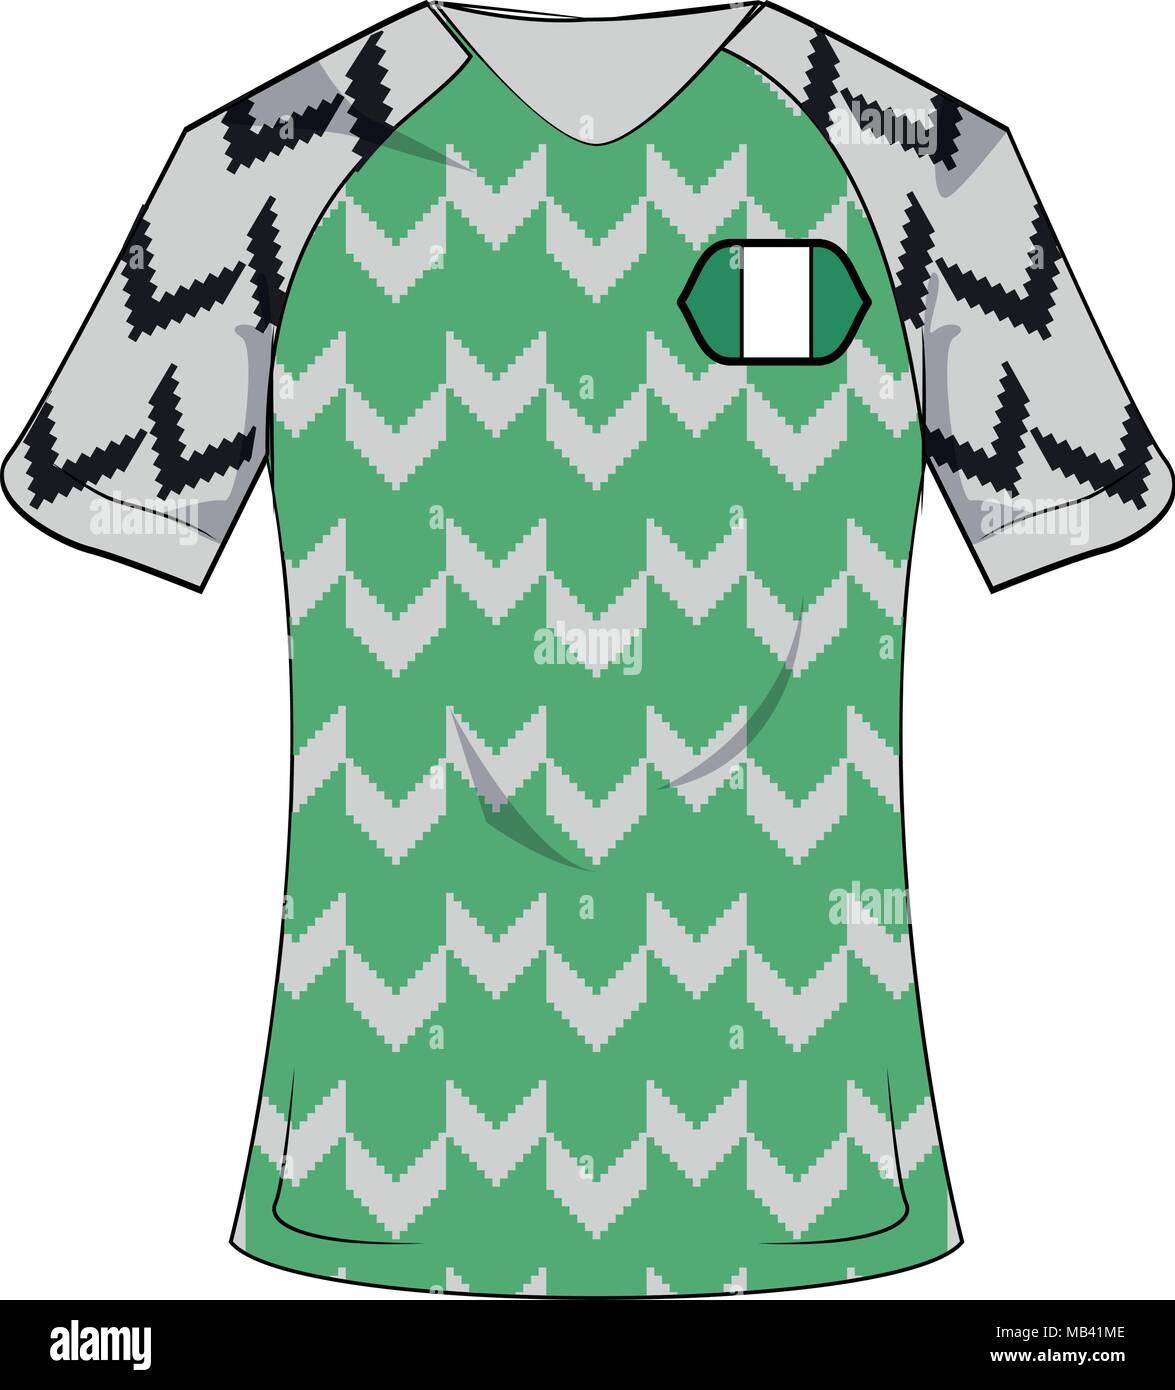 promo code e8deb 2cd9d Nigeria soccer sport wear Stock Vector Art & Illustration ...